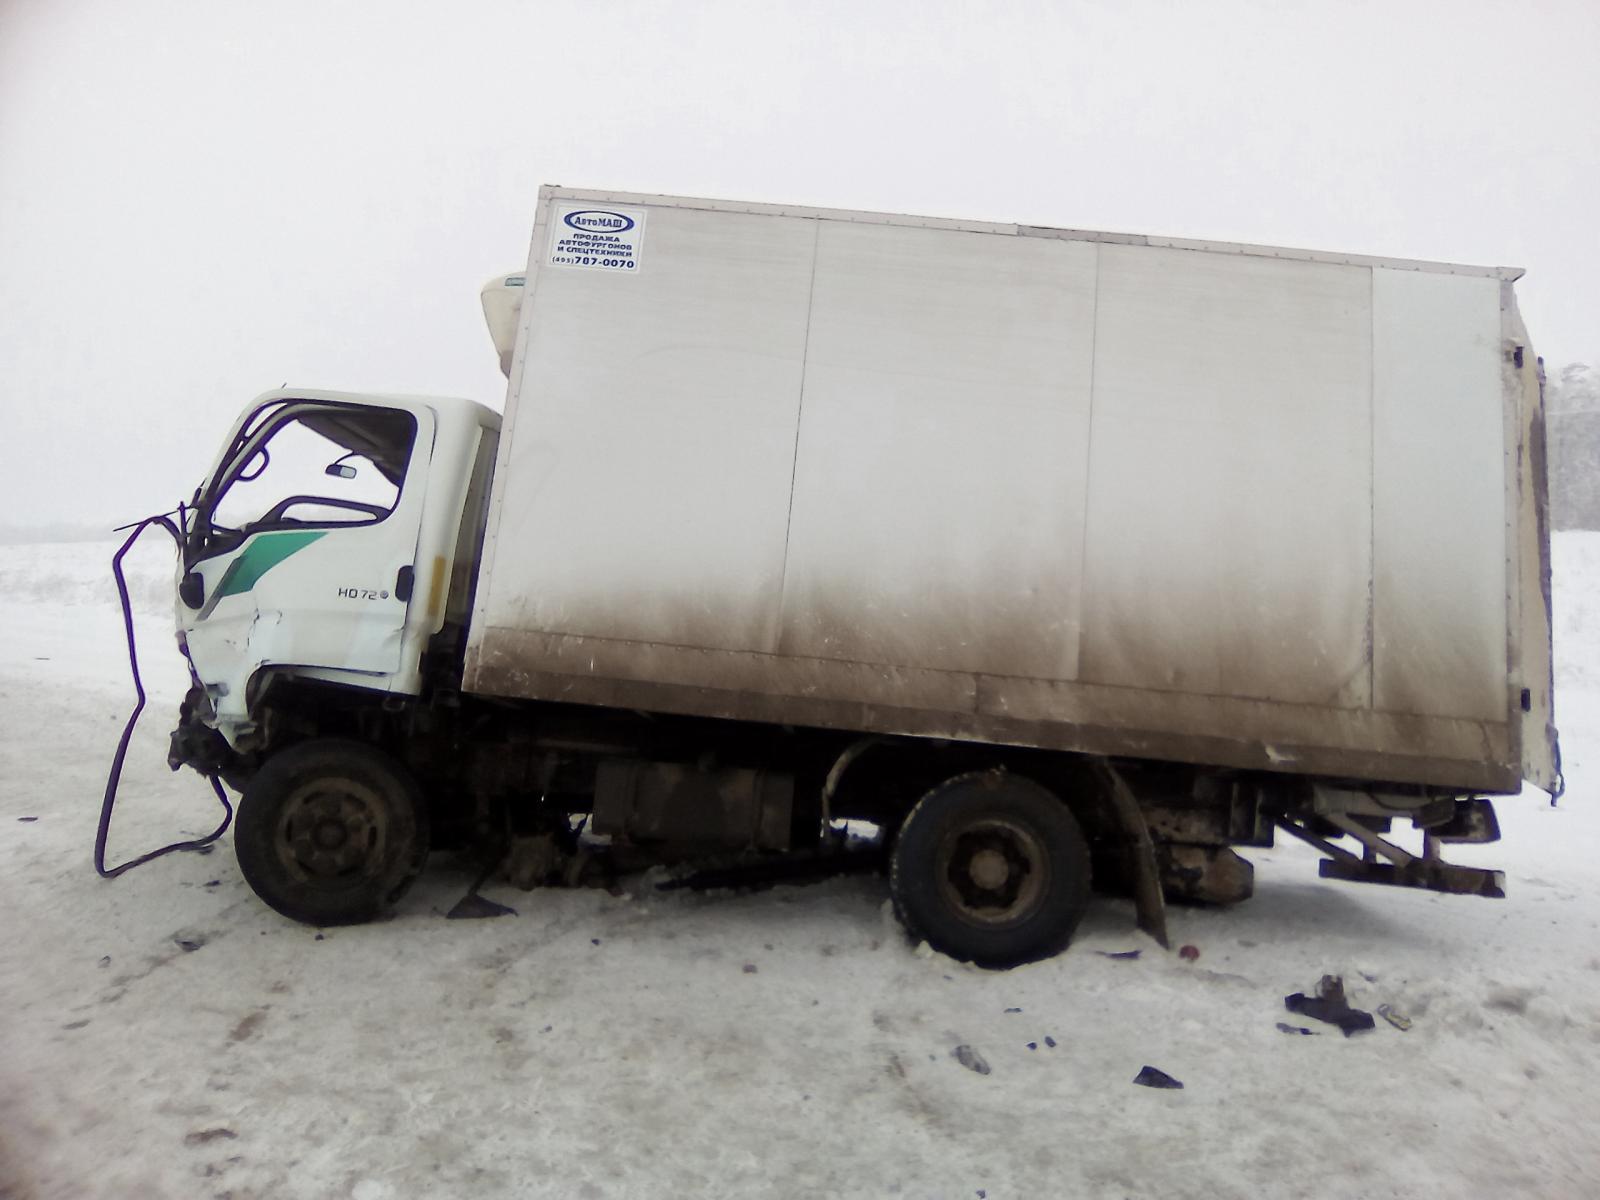 Натрассе Оренбург-Самара встолкновении легковушки и фургона погибла девушка